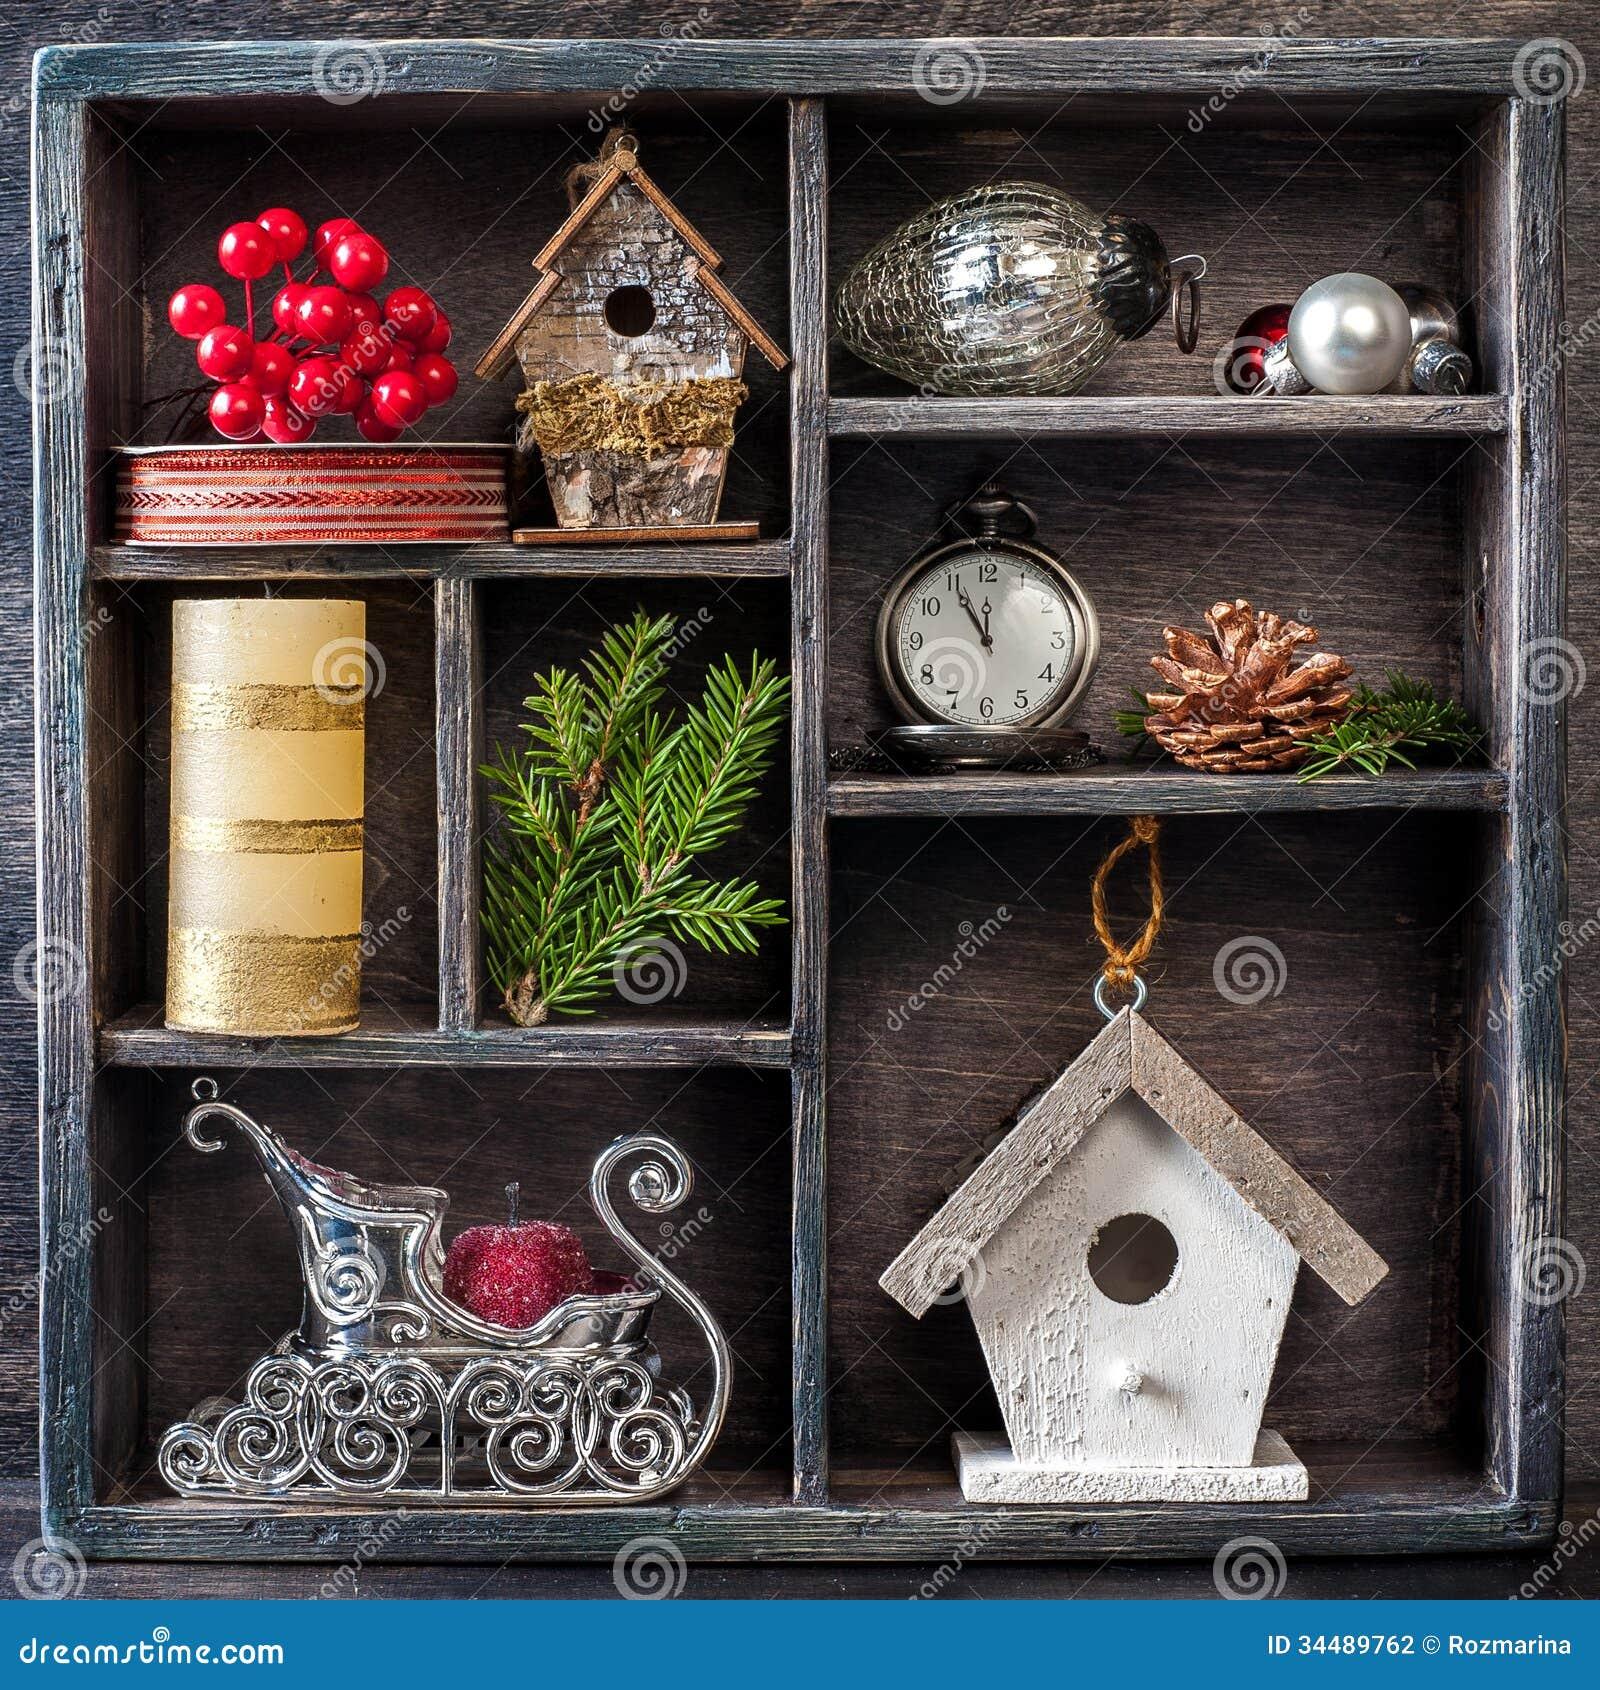 Christmas Decorations Set: Antique Clocks, Birdhouse ...